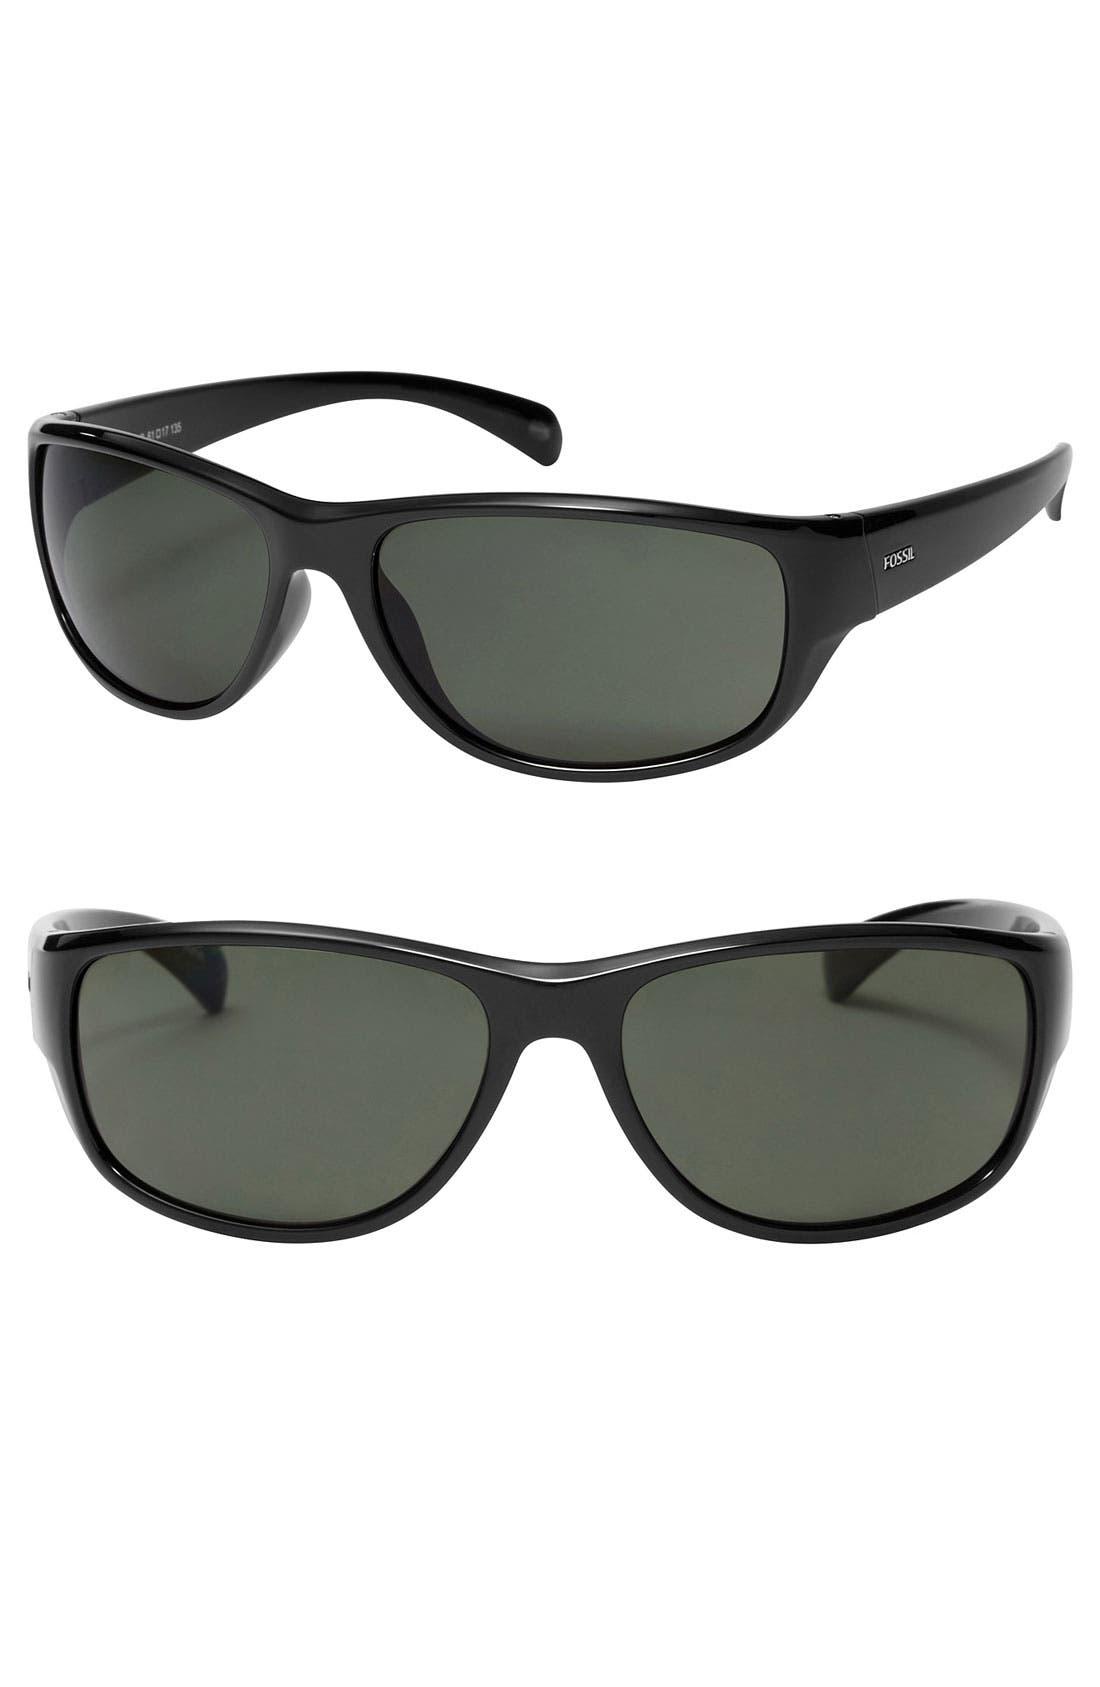 Alternate Image 1 Selected - Fossil 'Blake' 61mm Sunglasses